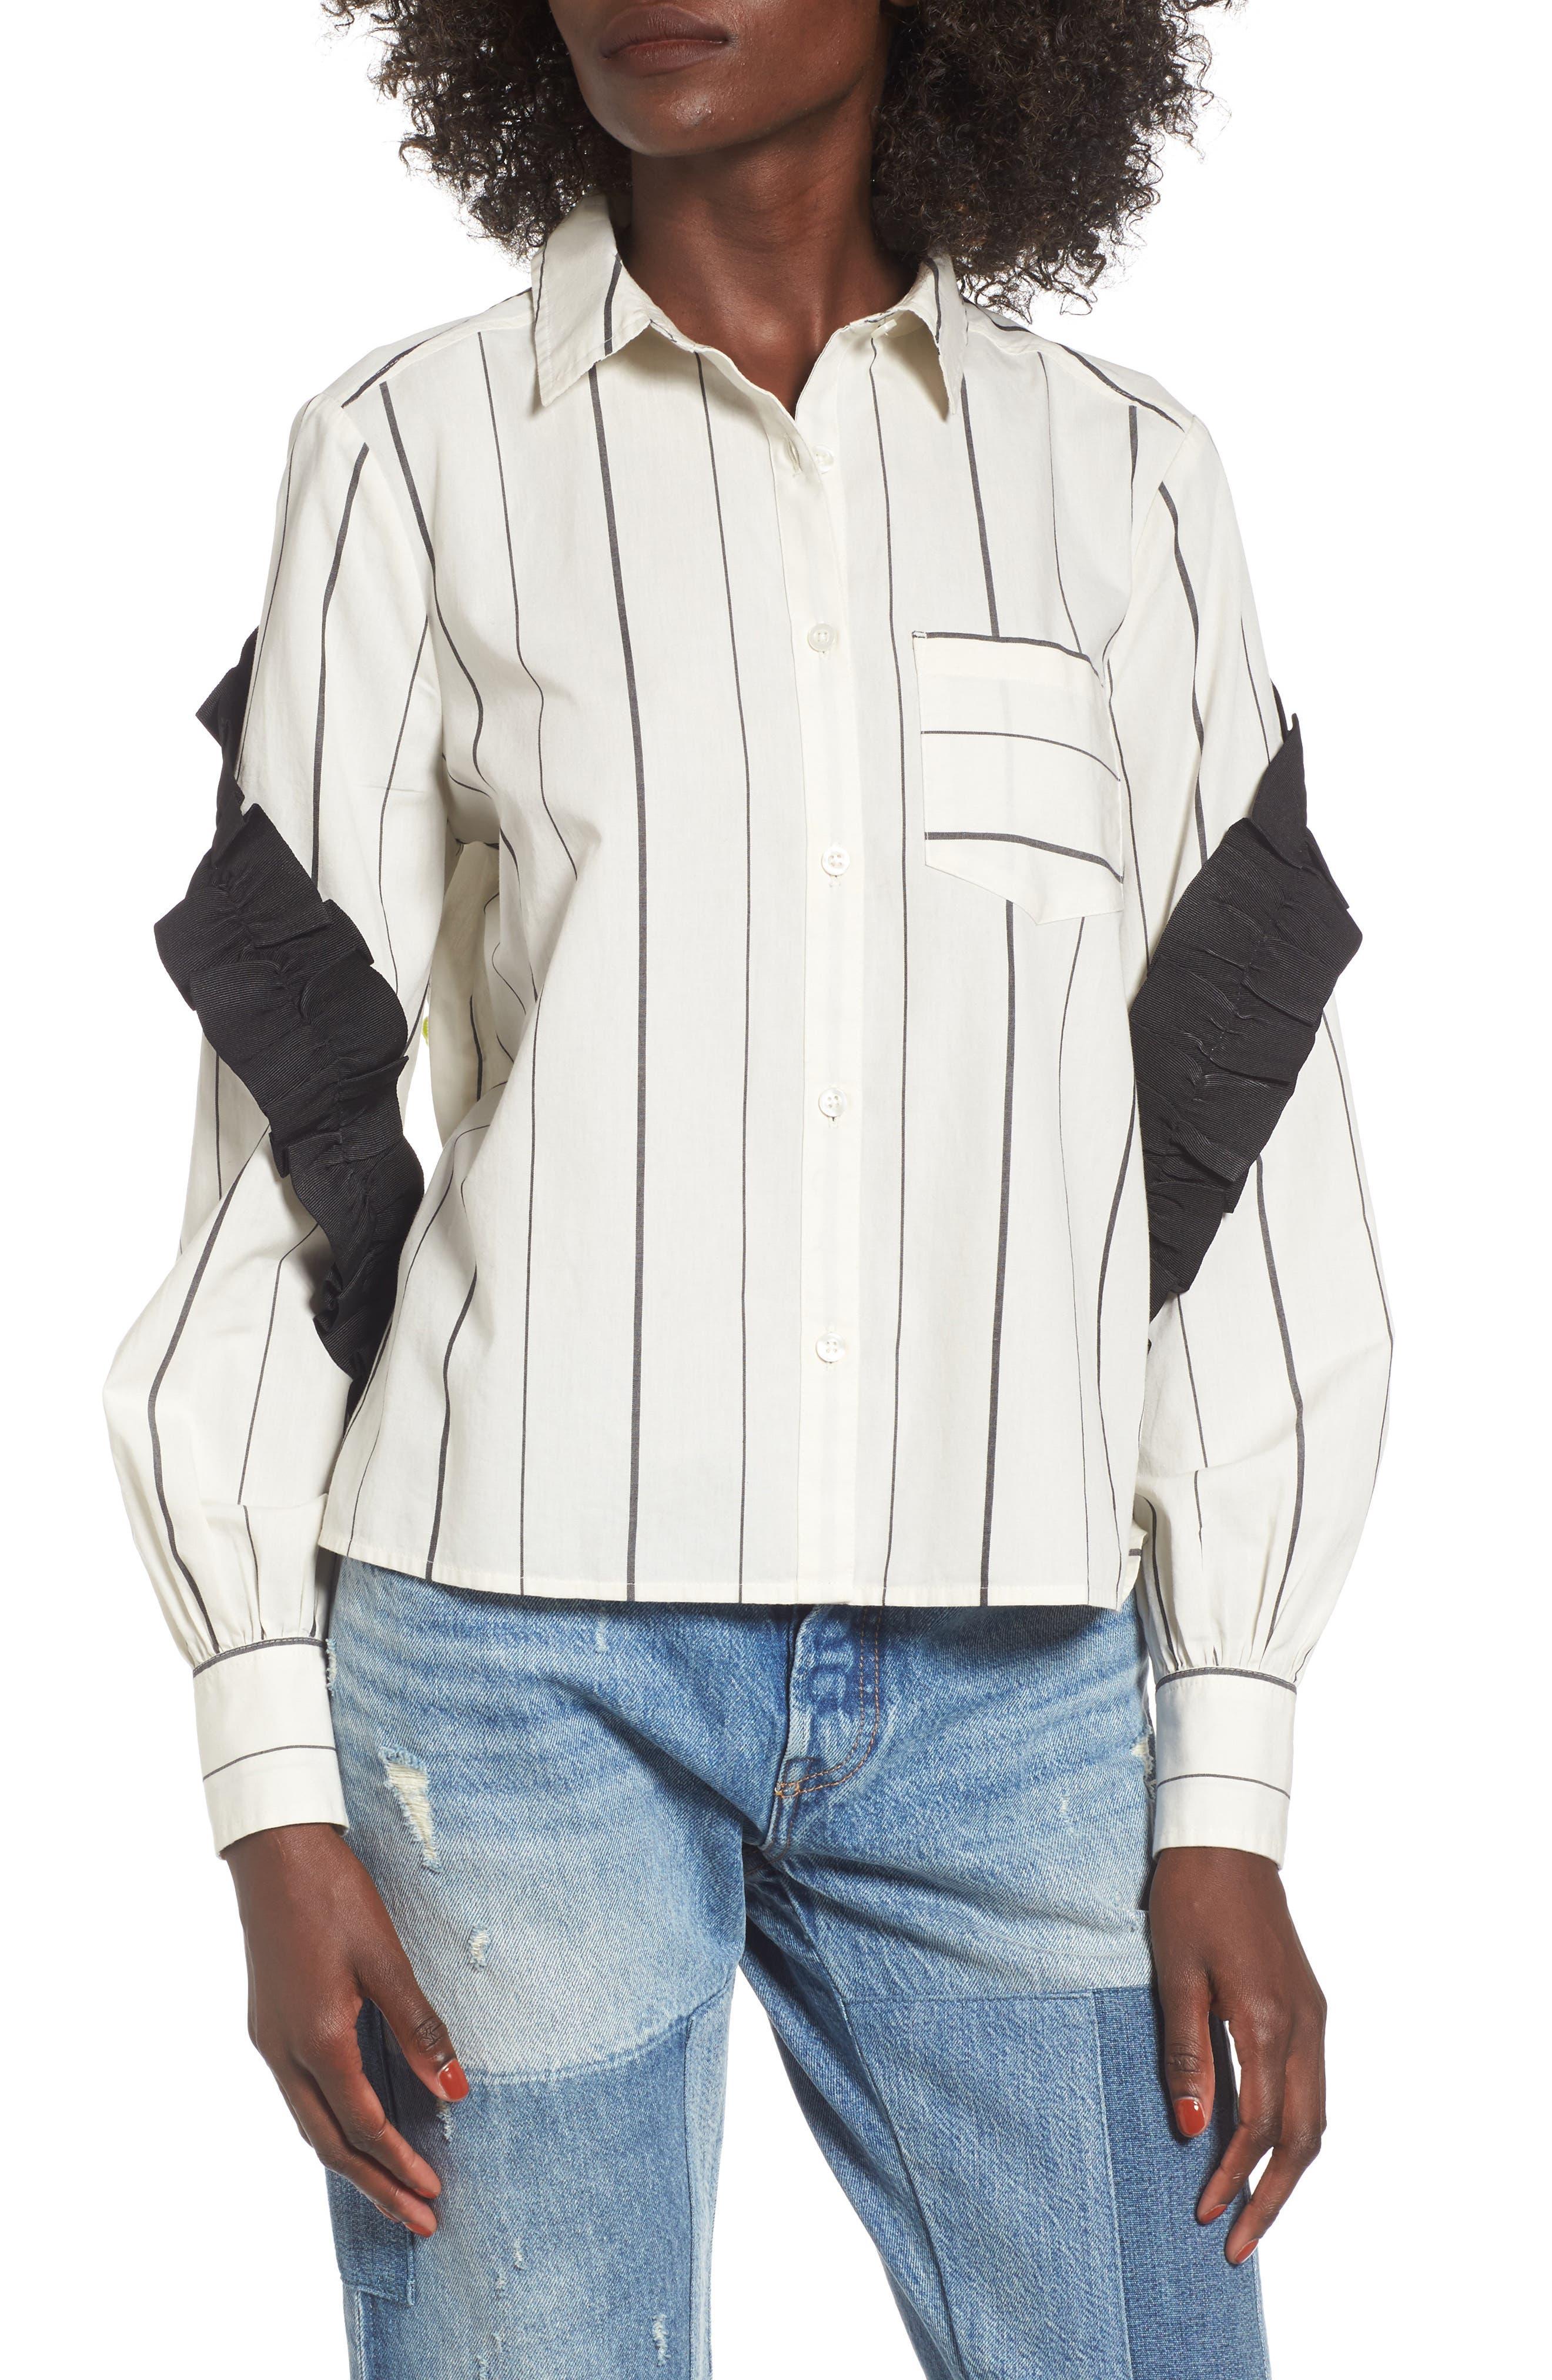 Grosgrain Ruffle Stripe Shirt,                             Main thumbnail 1, color,                             Ivory Egret Finn Stripe